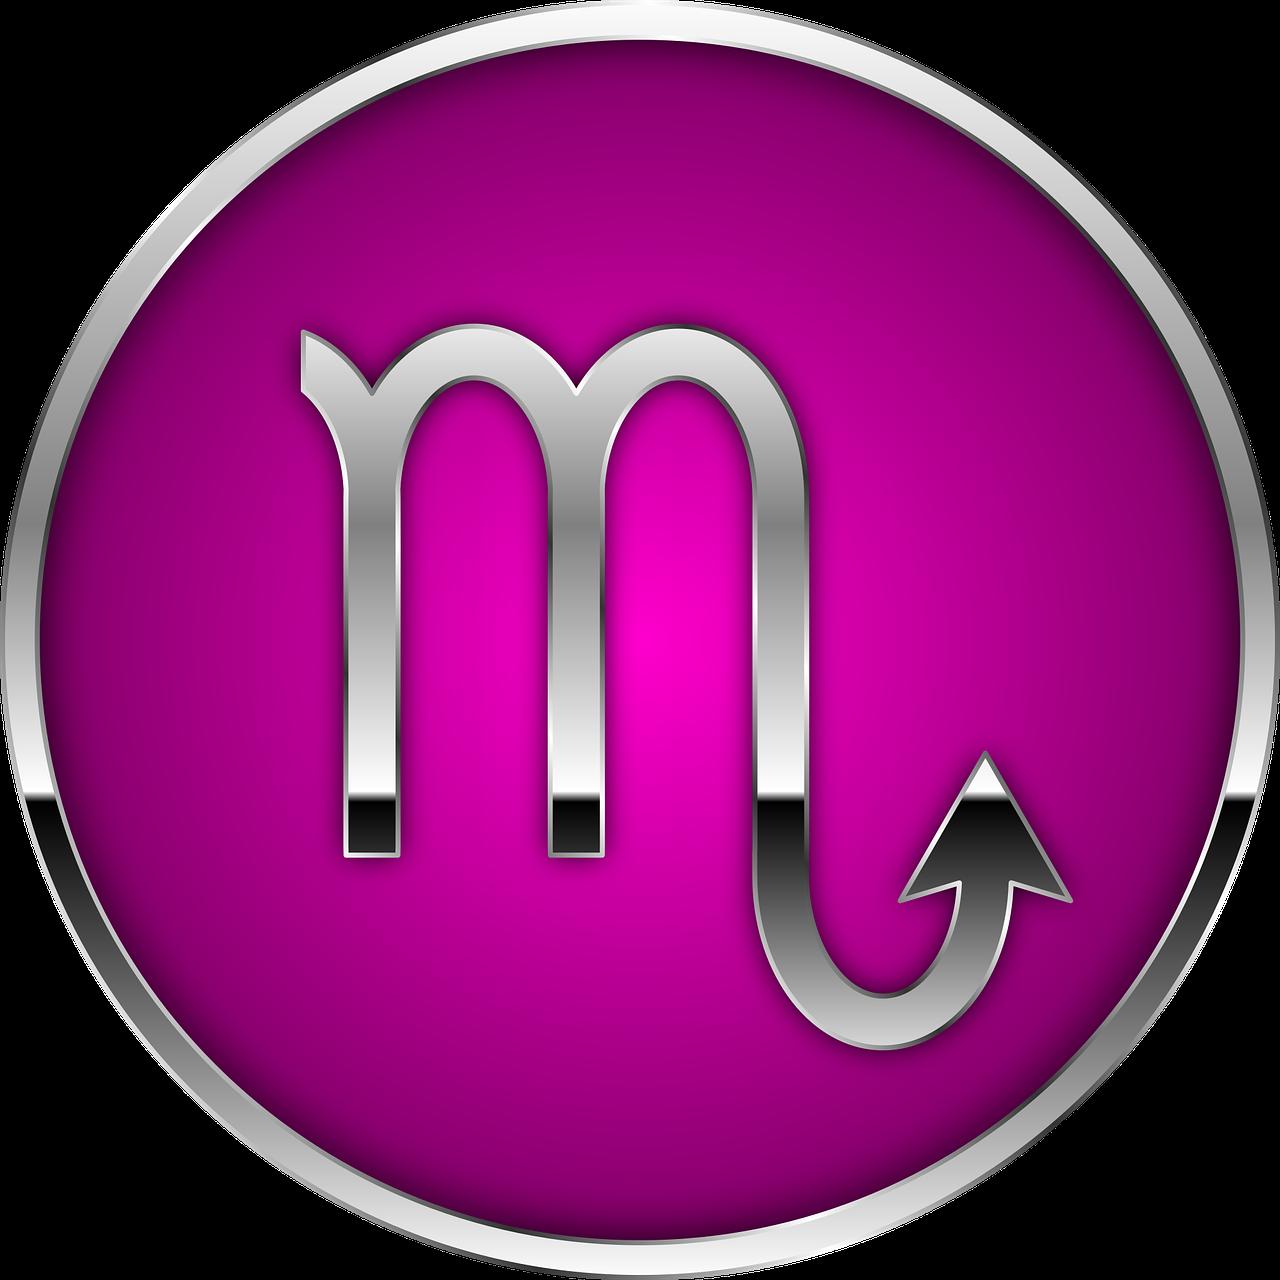 Image result for scorpio sign